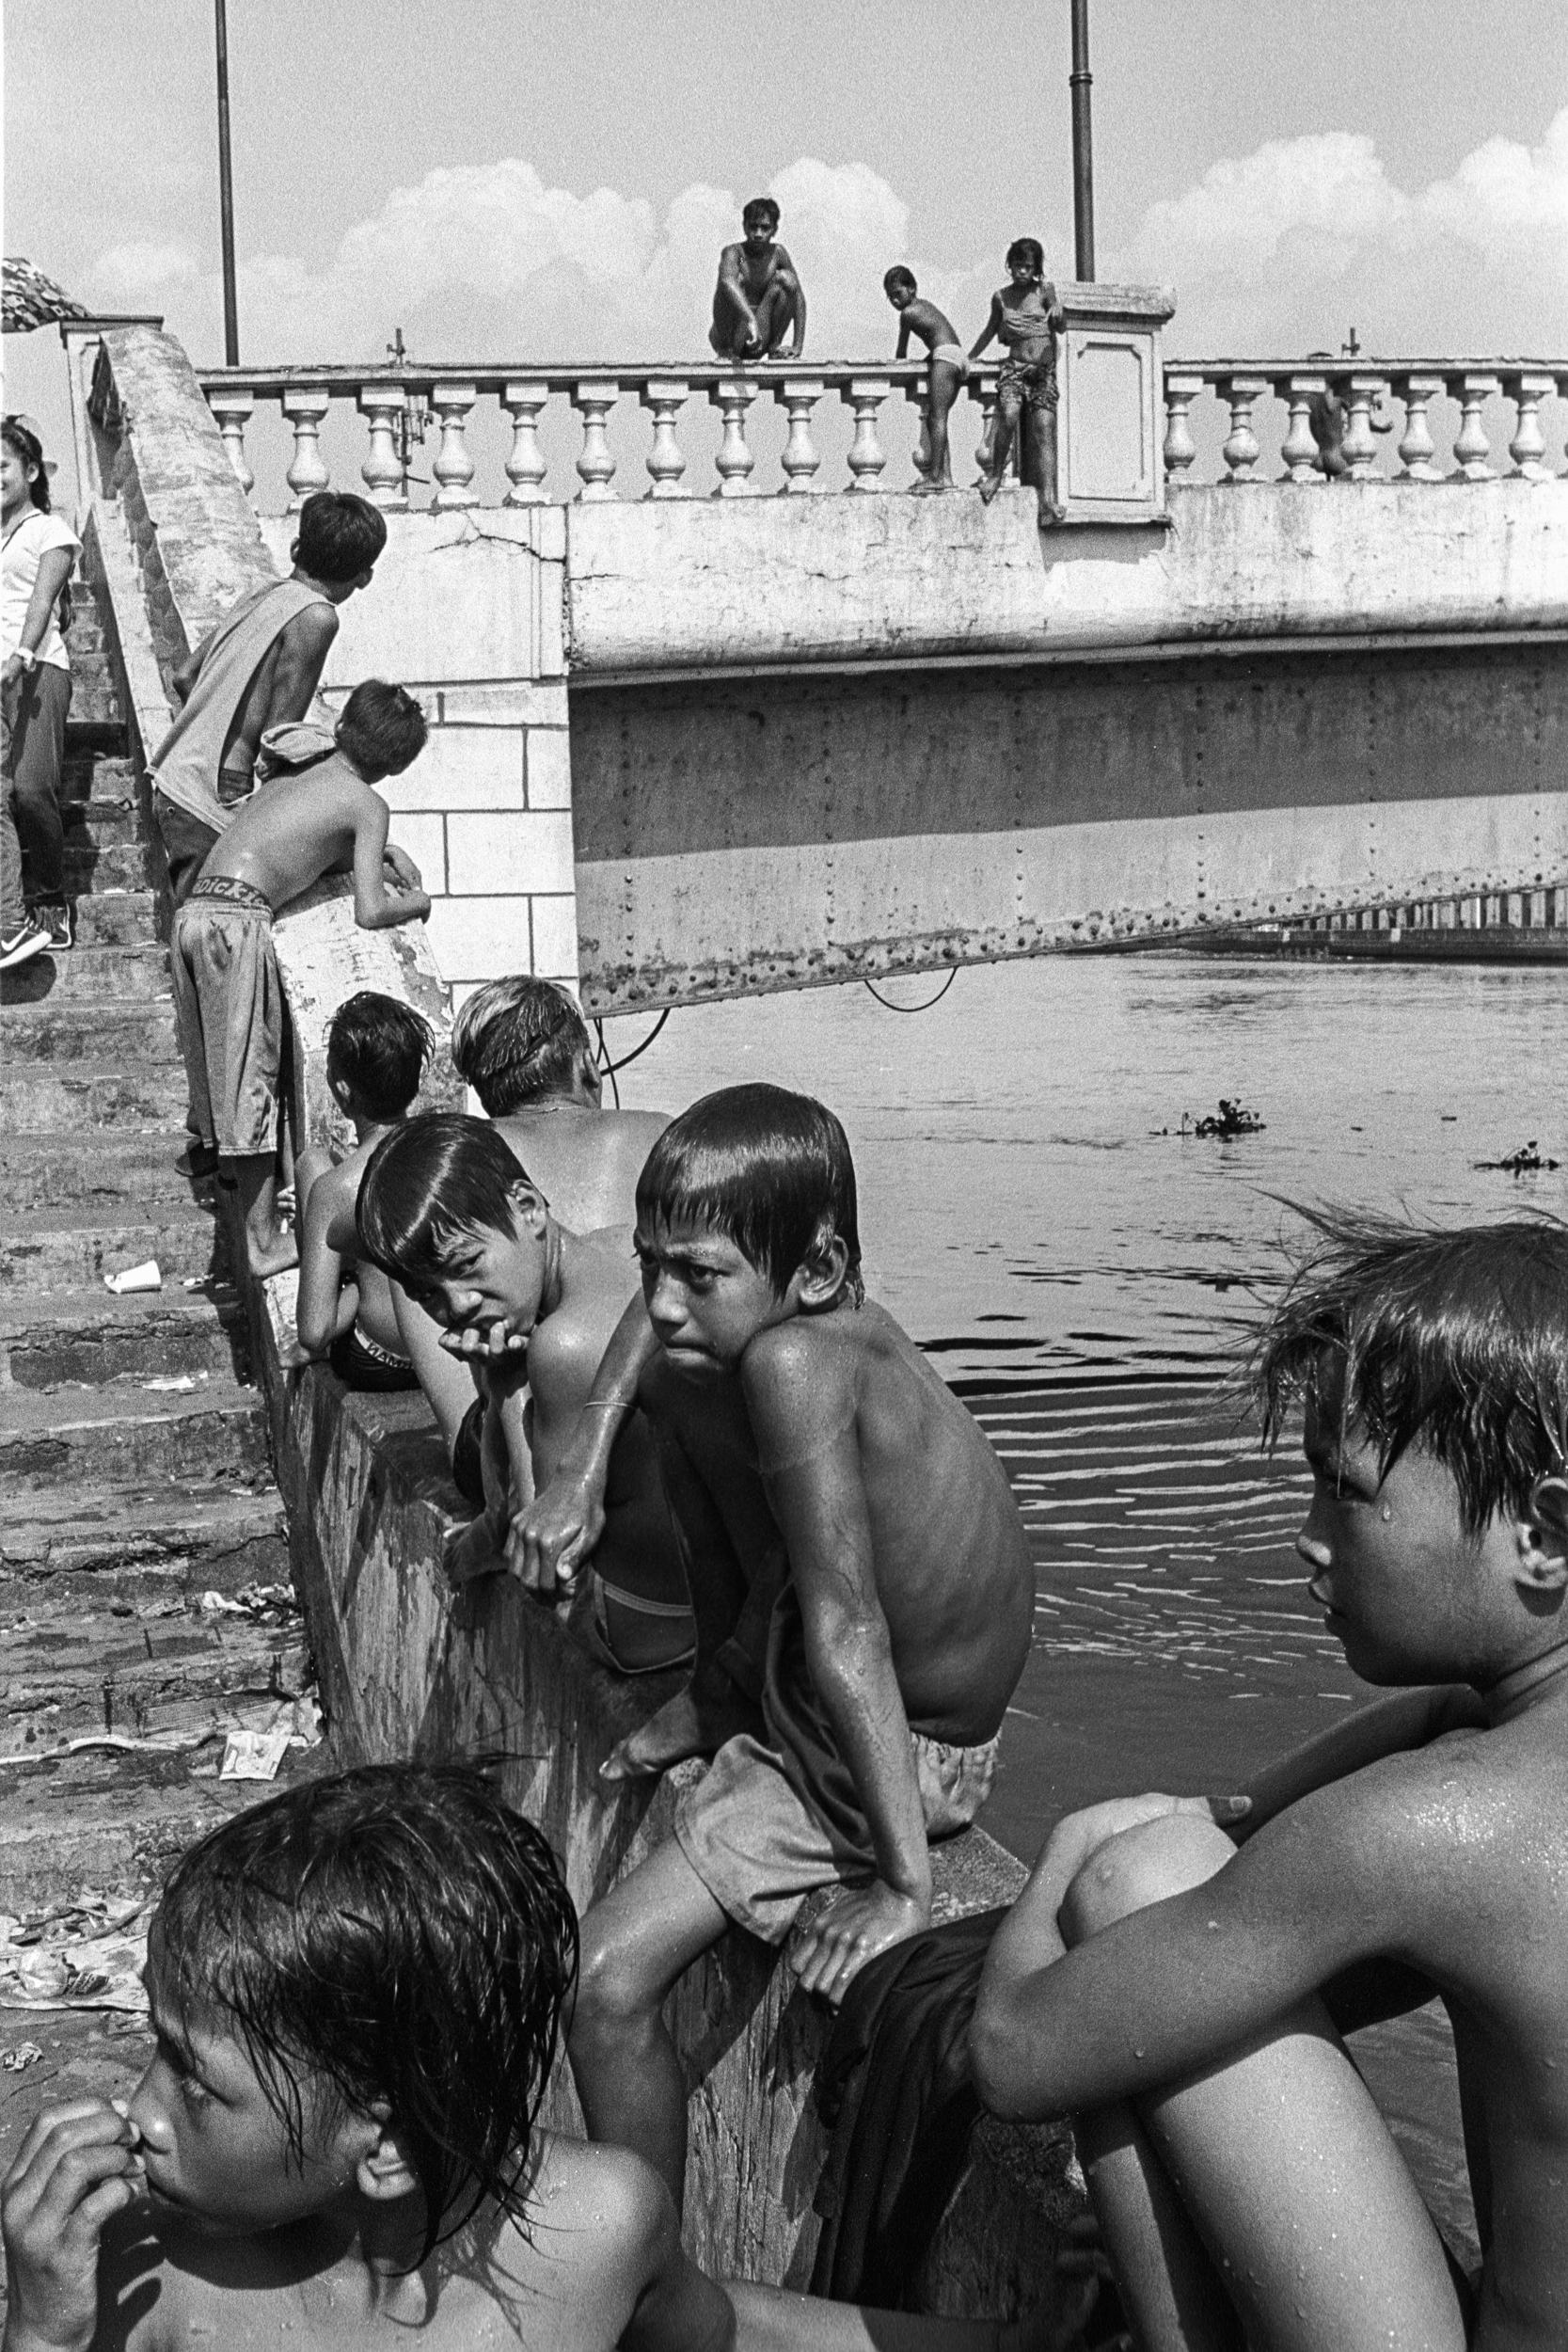 Jones Bridge kids, Binondo, Manila, 2018.